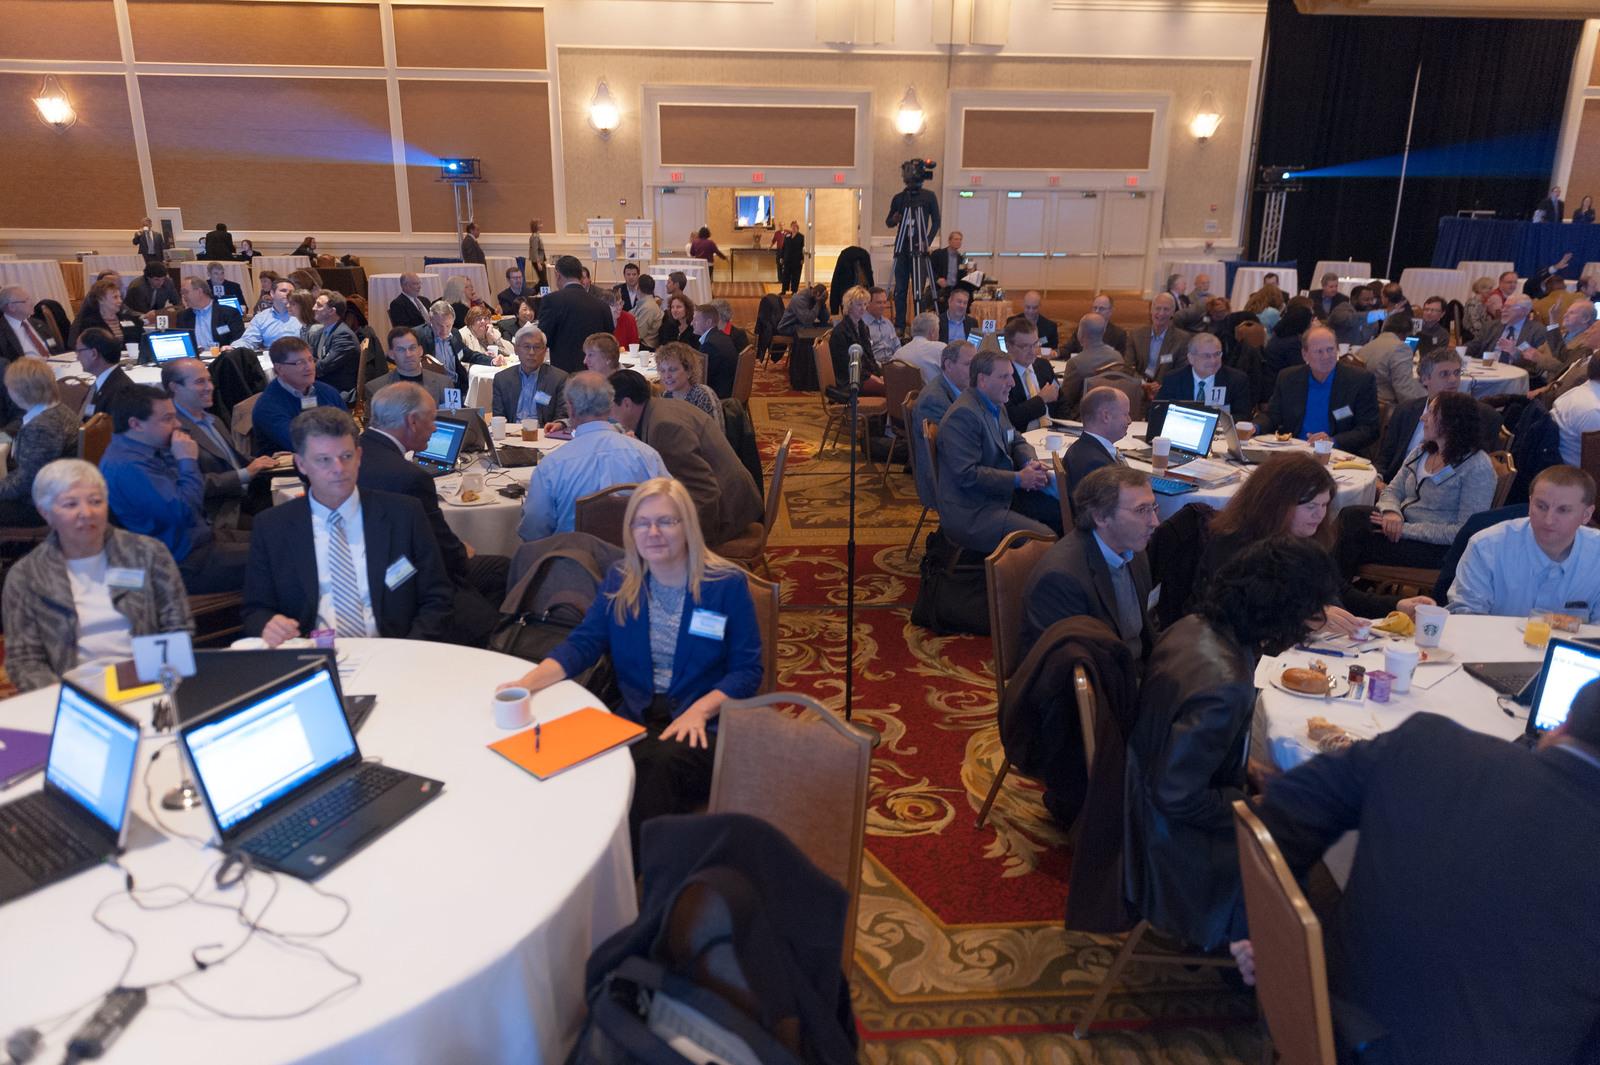 Office of the Administrator - EPA National Executive Leadership Development Conference [412-APD-1169-2013-12-03_ELDC_005.jpg]